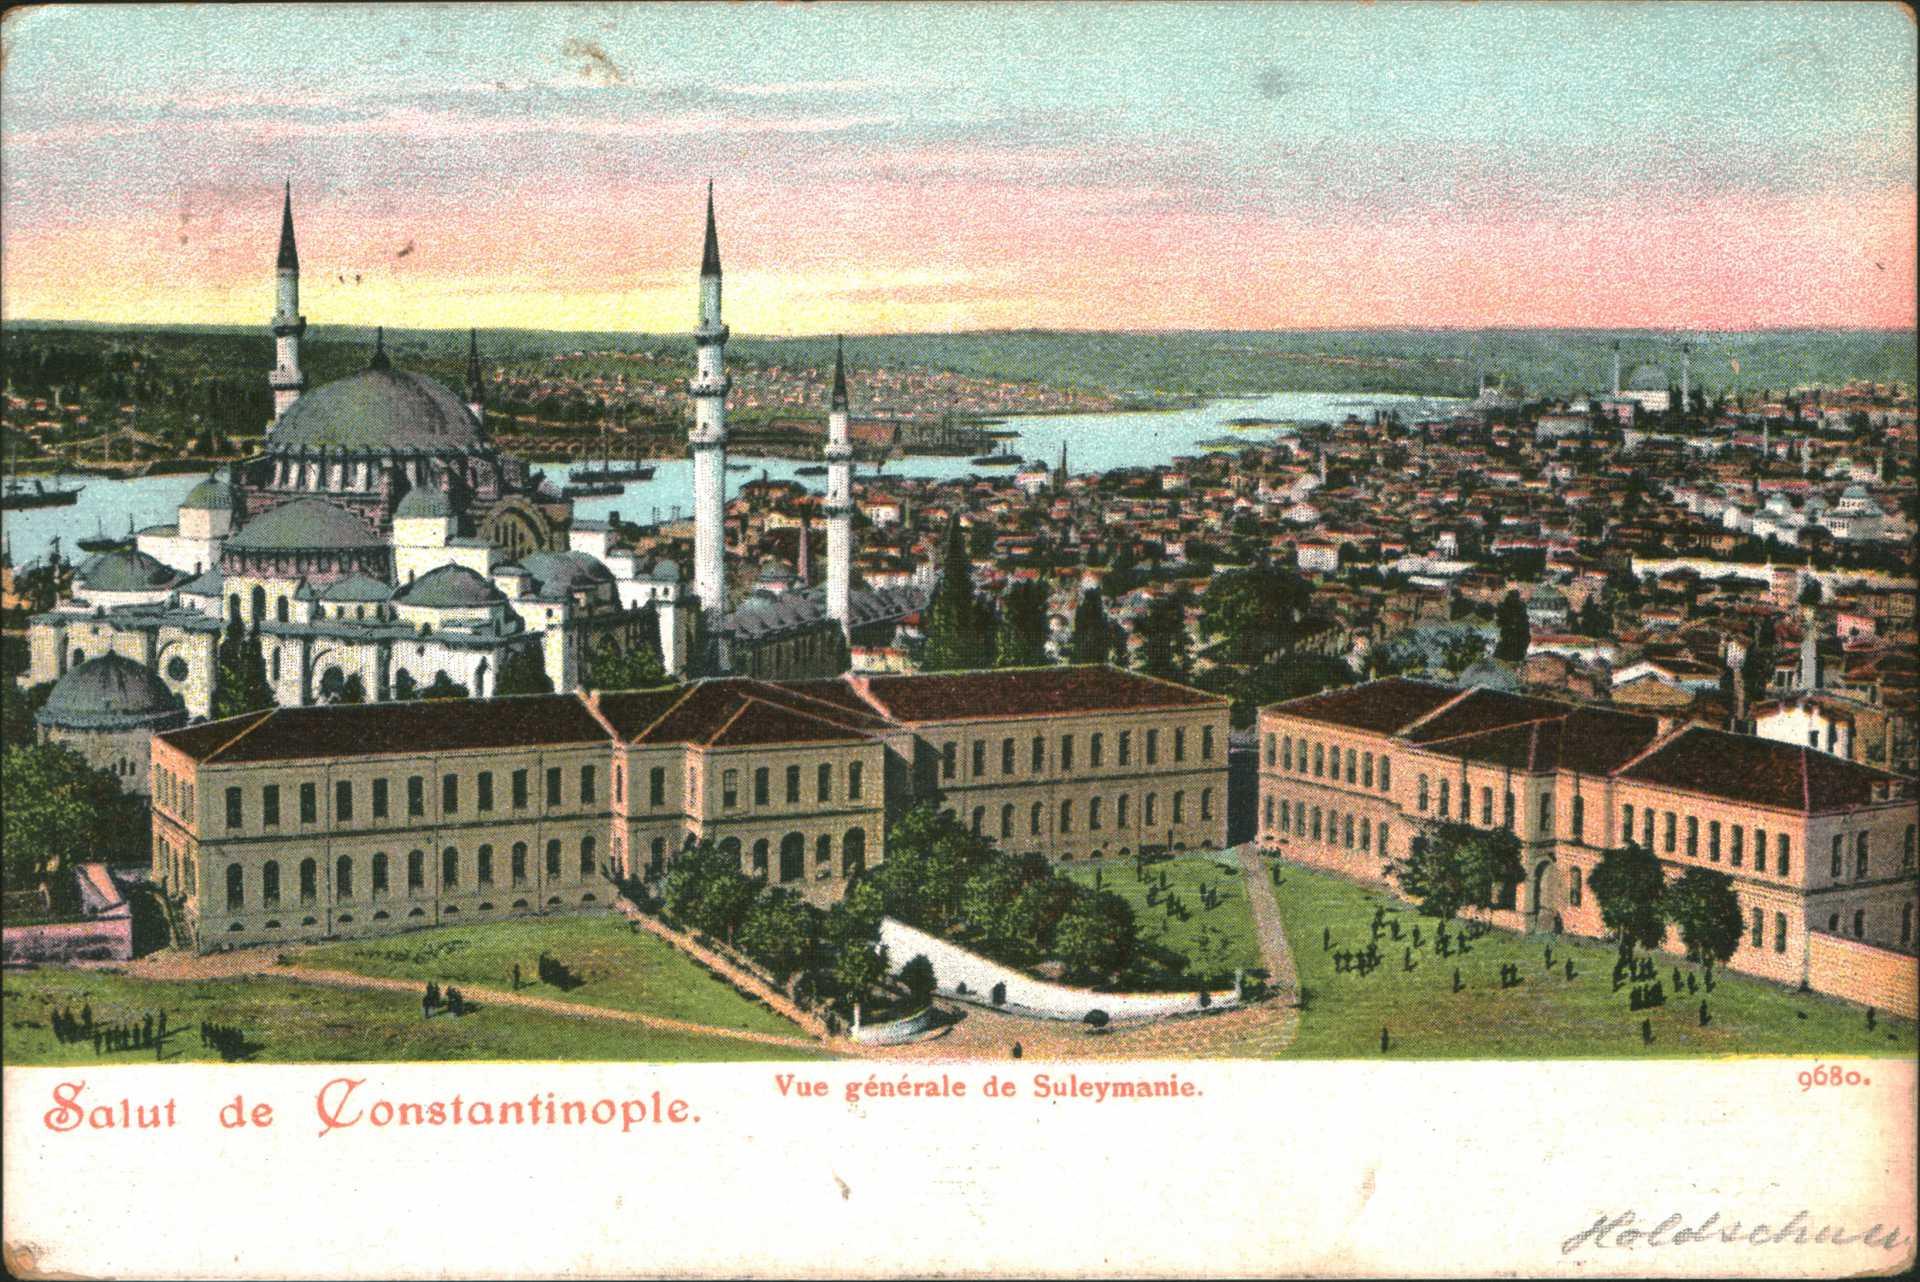 Vue generale de Süleymanie